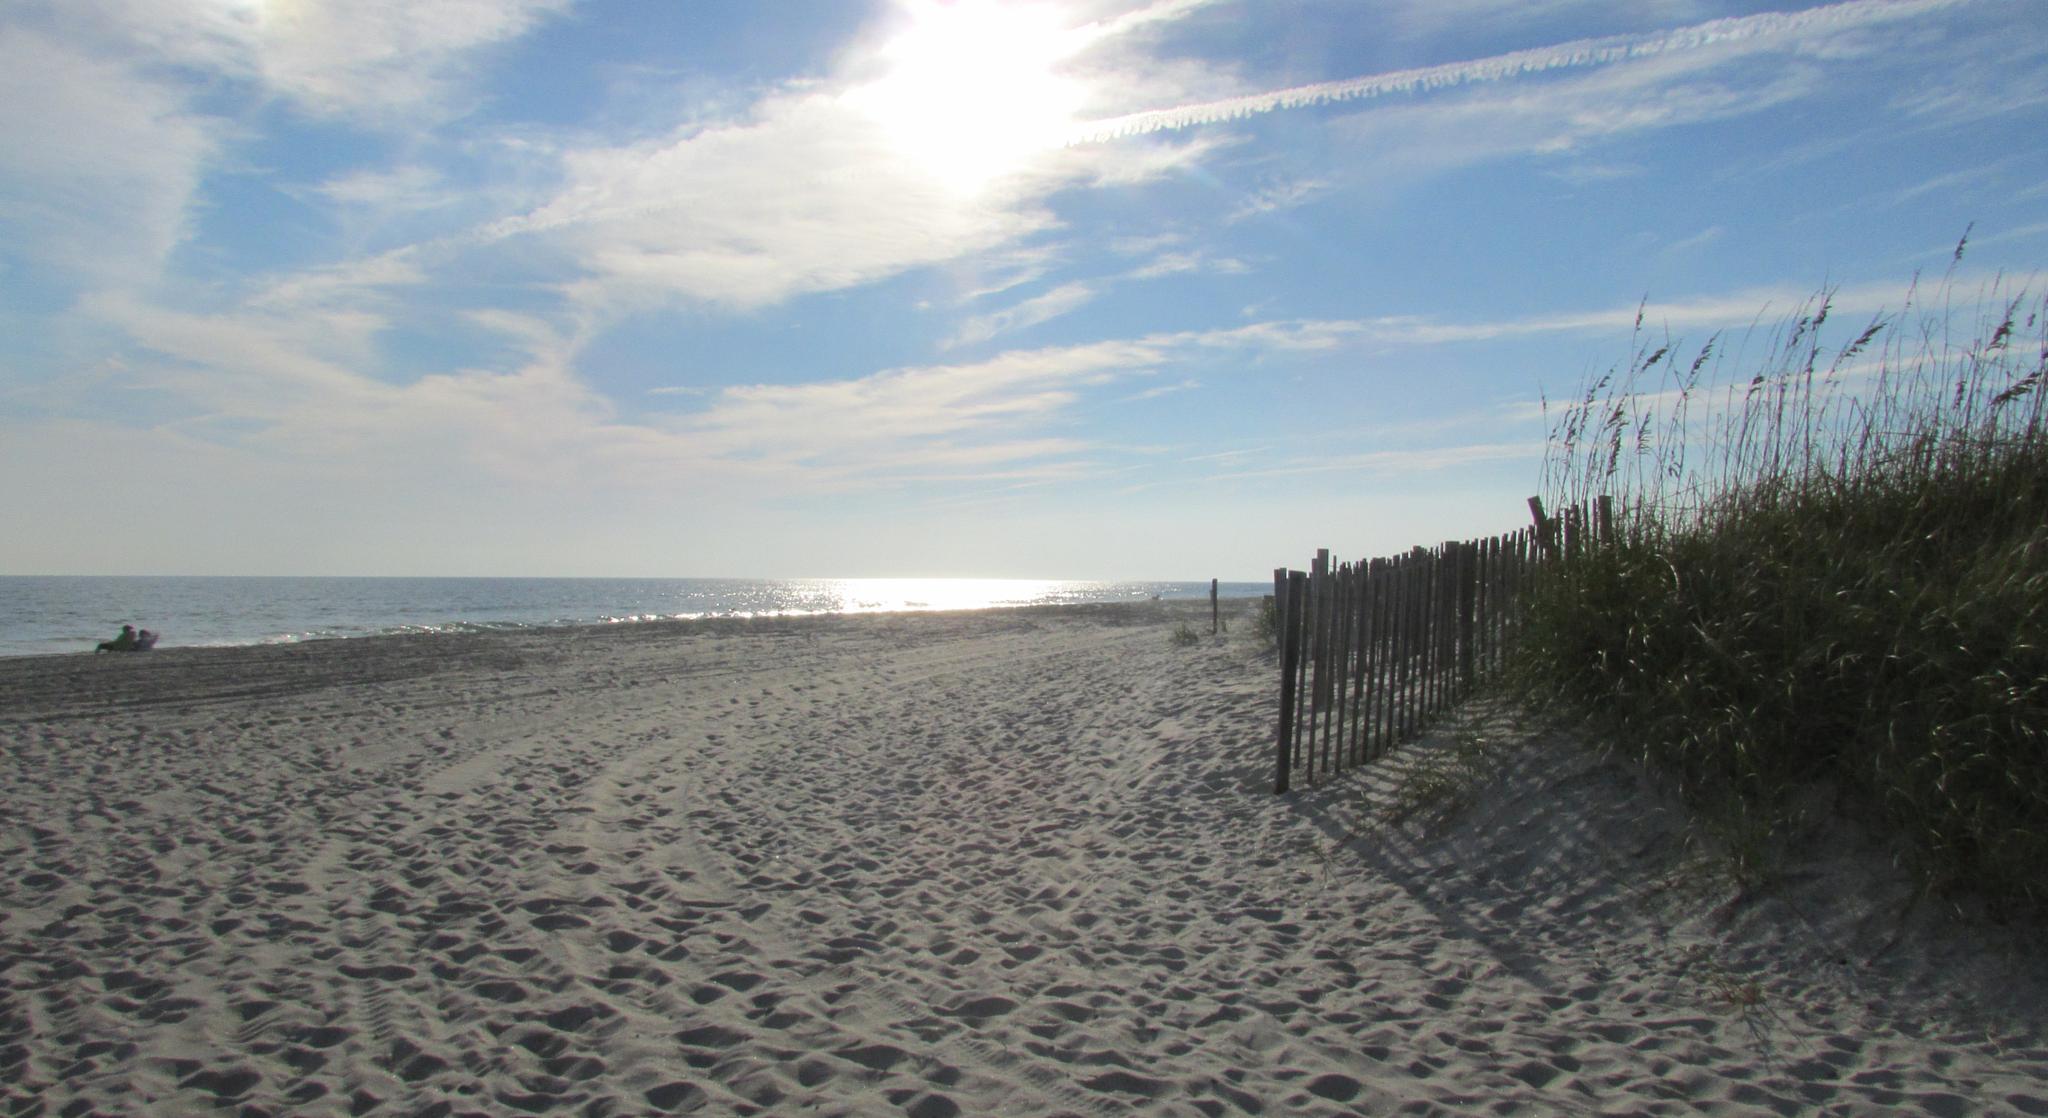 Beautiful Autumn Day on Atlantic Beach, North Carolina by Lisa Marshall Moore